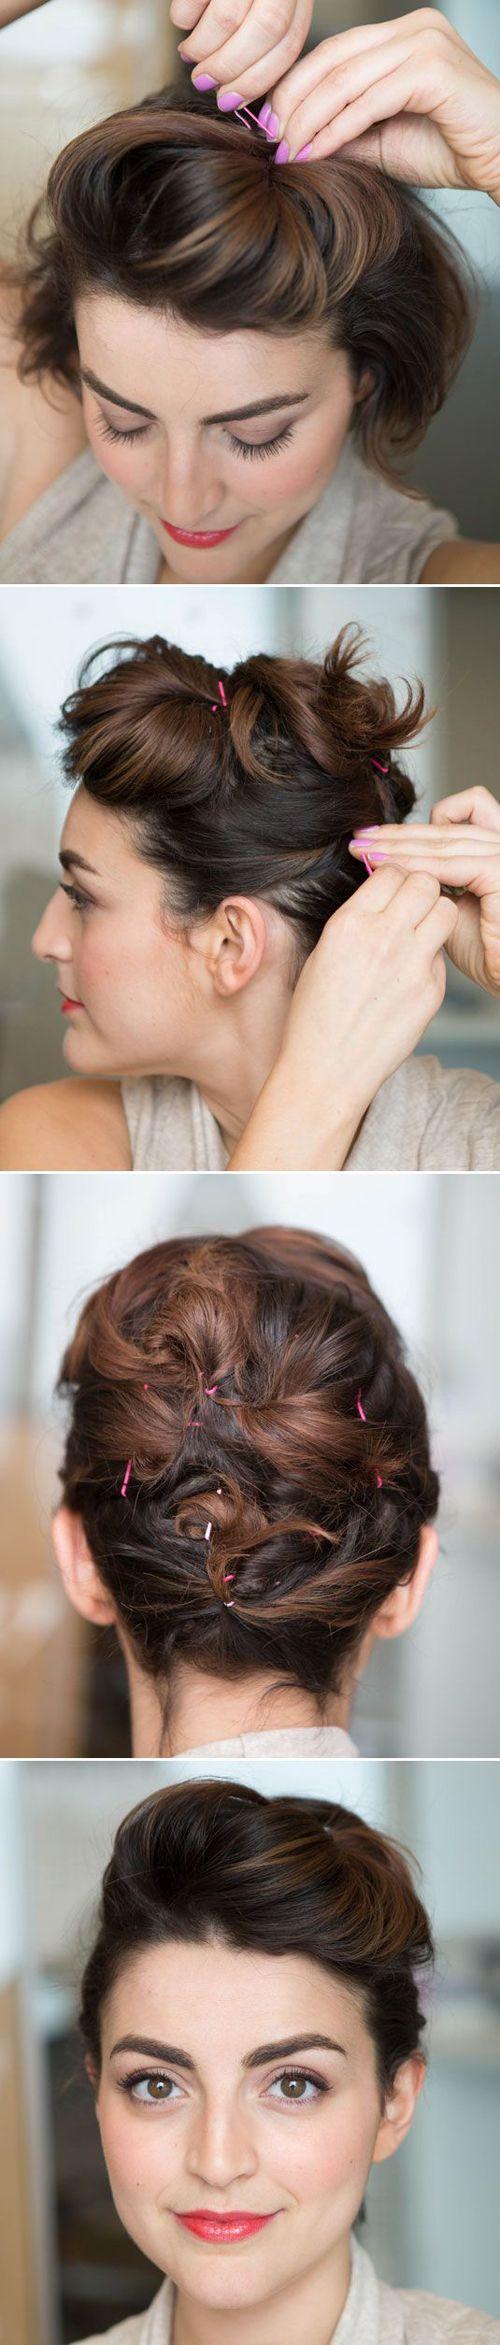 20 peinados simples para cabello corto